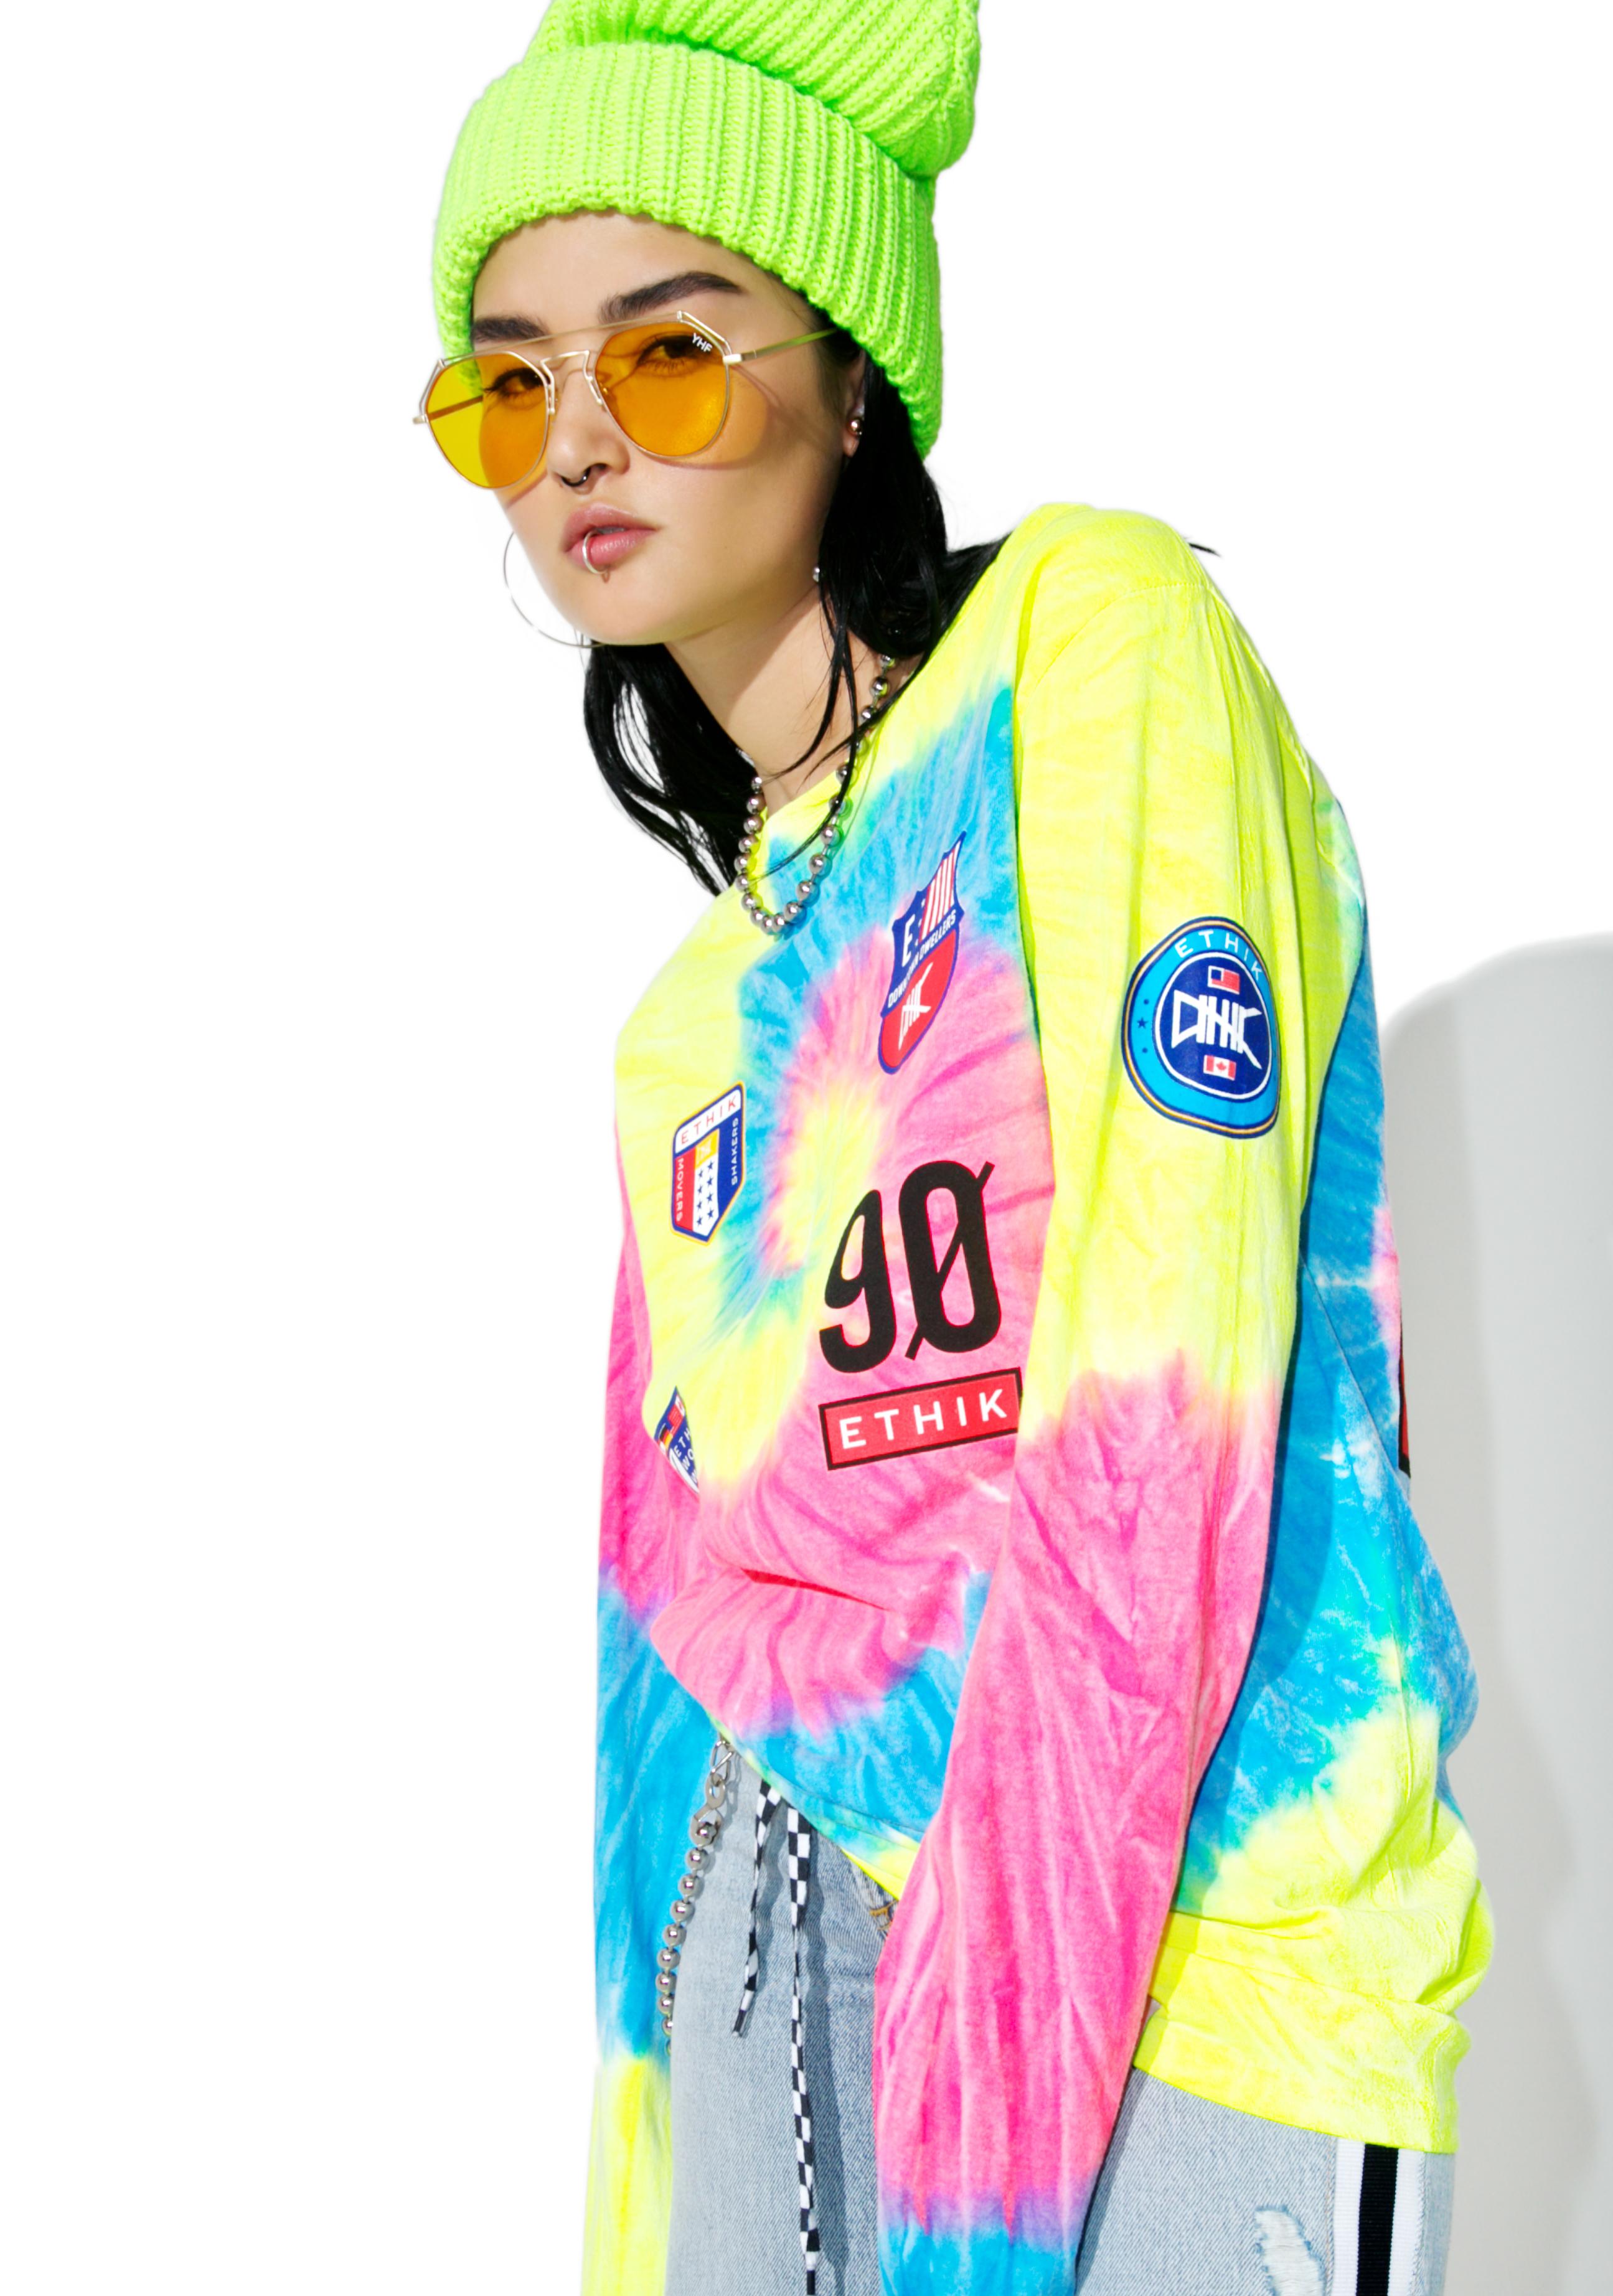 ETHIK Neon Trippy Sport Long Sleeve Tee